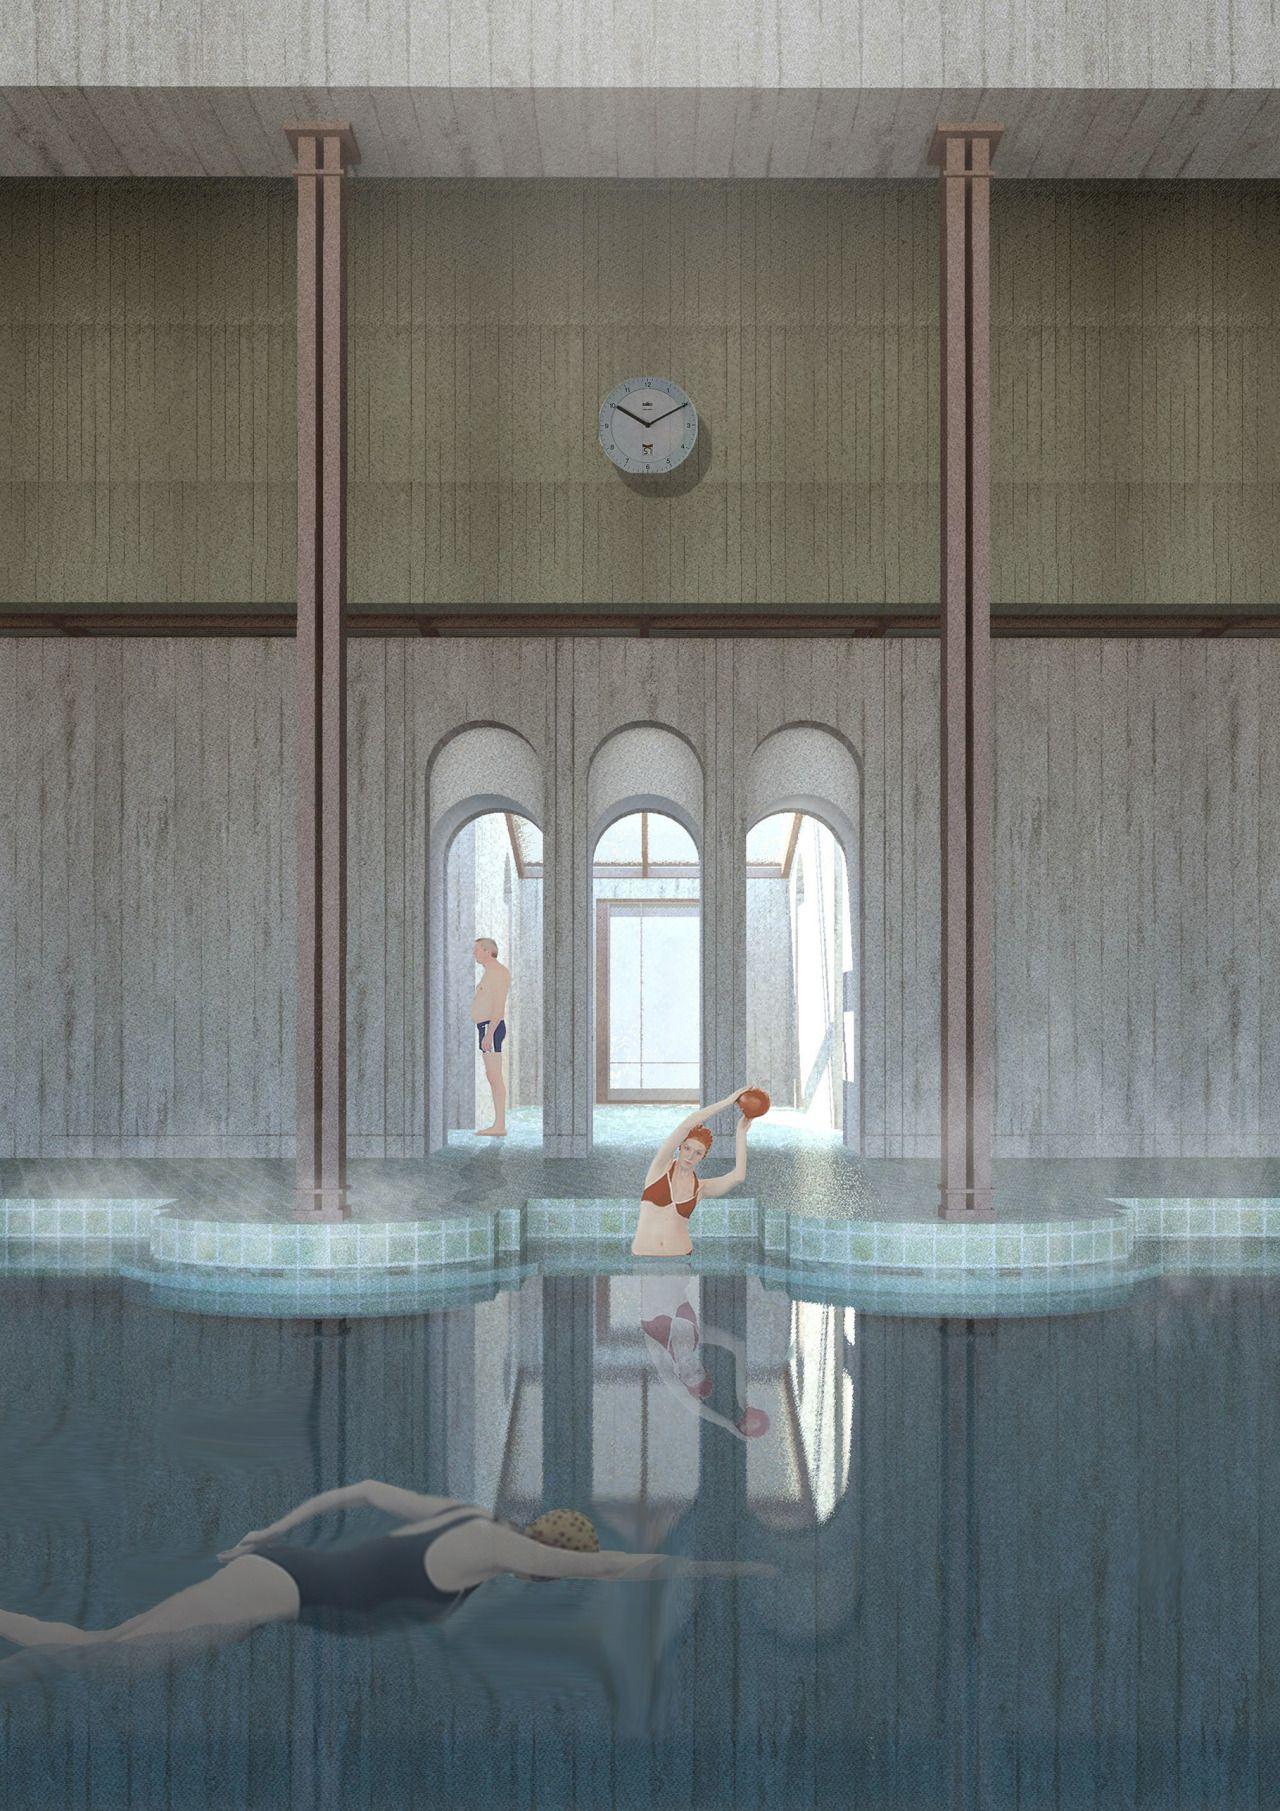 Frigidarium Lost Mariner swimming pool by Deimante Bazyte The Royal